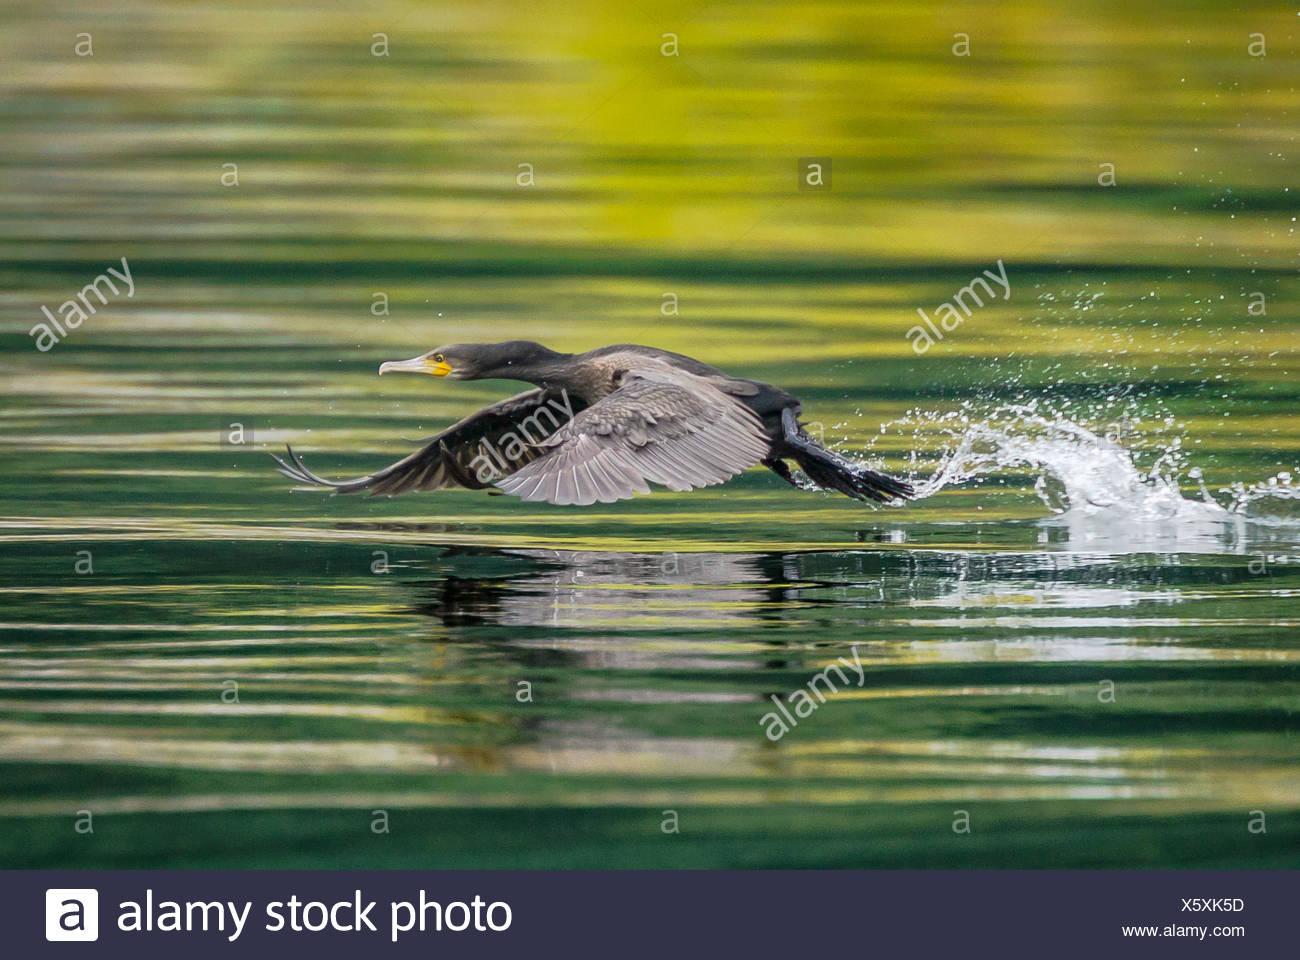 Vogel-Tiefflug über Wasser Stockbild